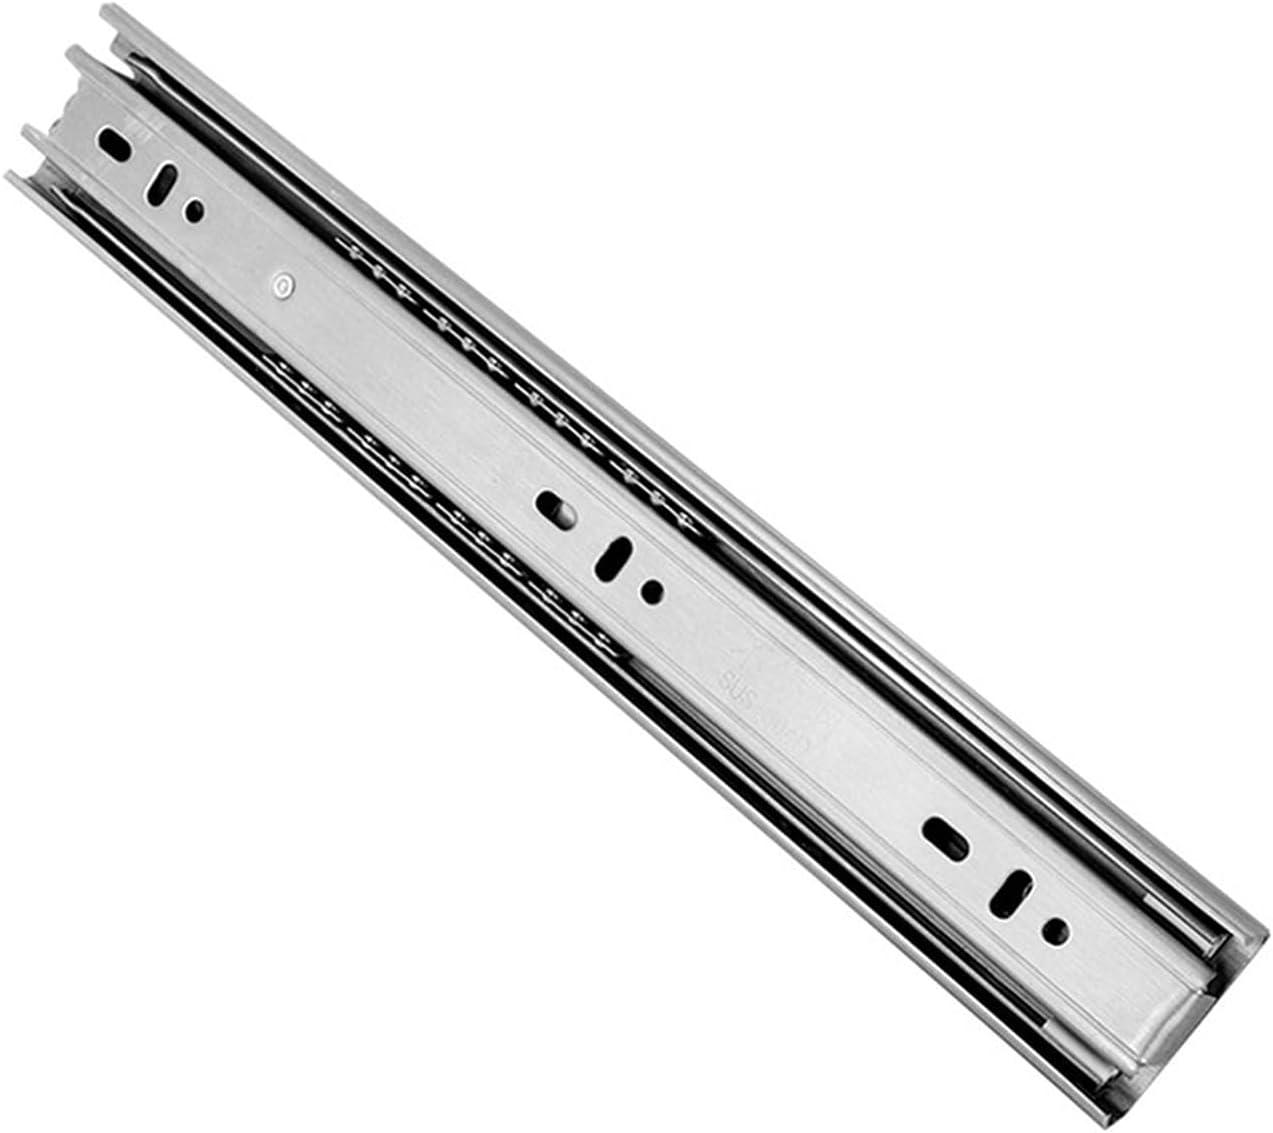 LQHZ Drawer Slide Stainless Rails NEW Popular brand in the world Three-Se Thickened Steel